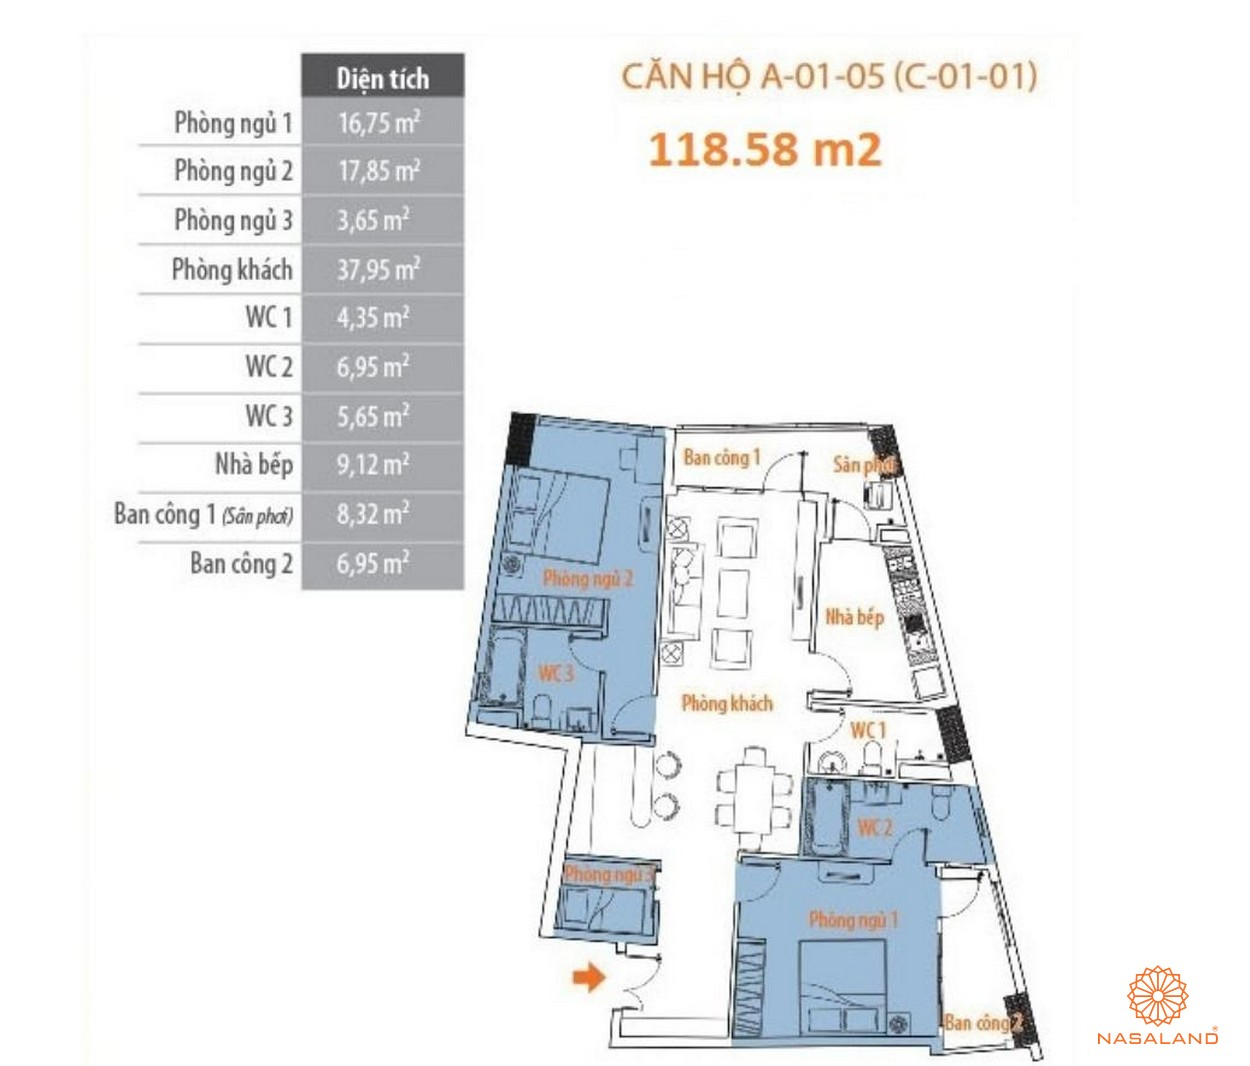 Thiết kế tổng quan căn hộ Him Lam Riverside quận 7 - block A căn số 05